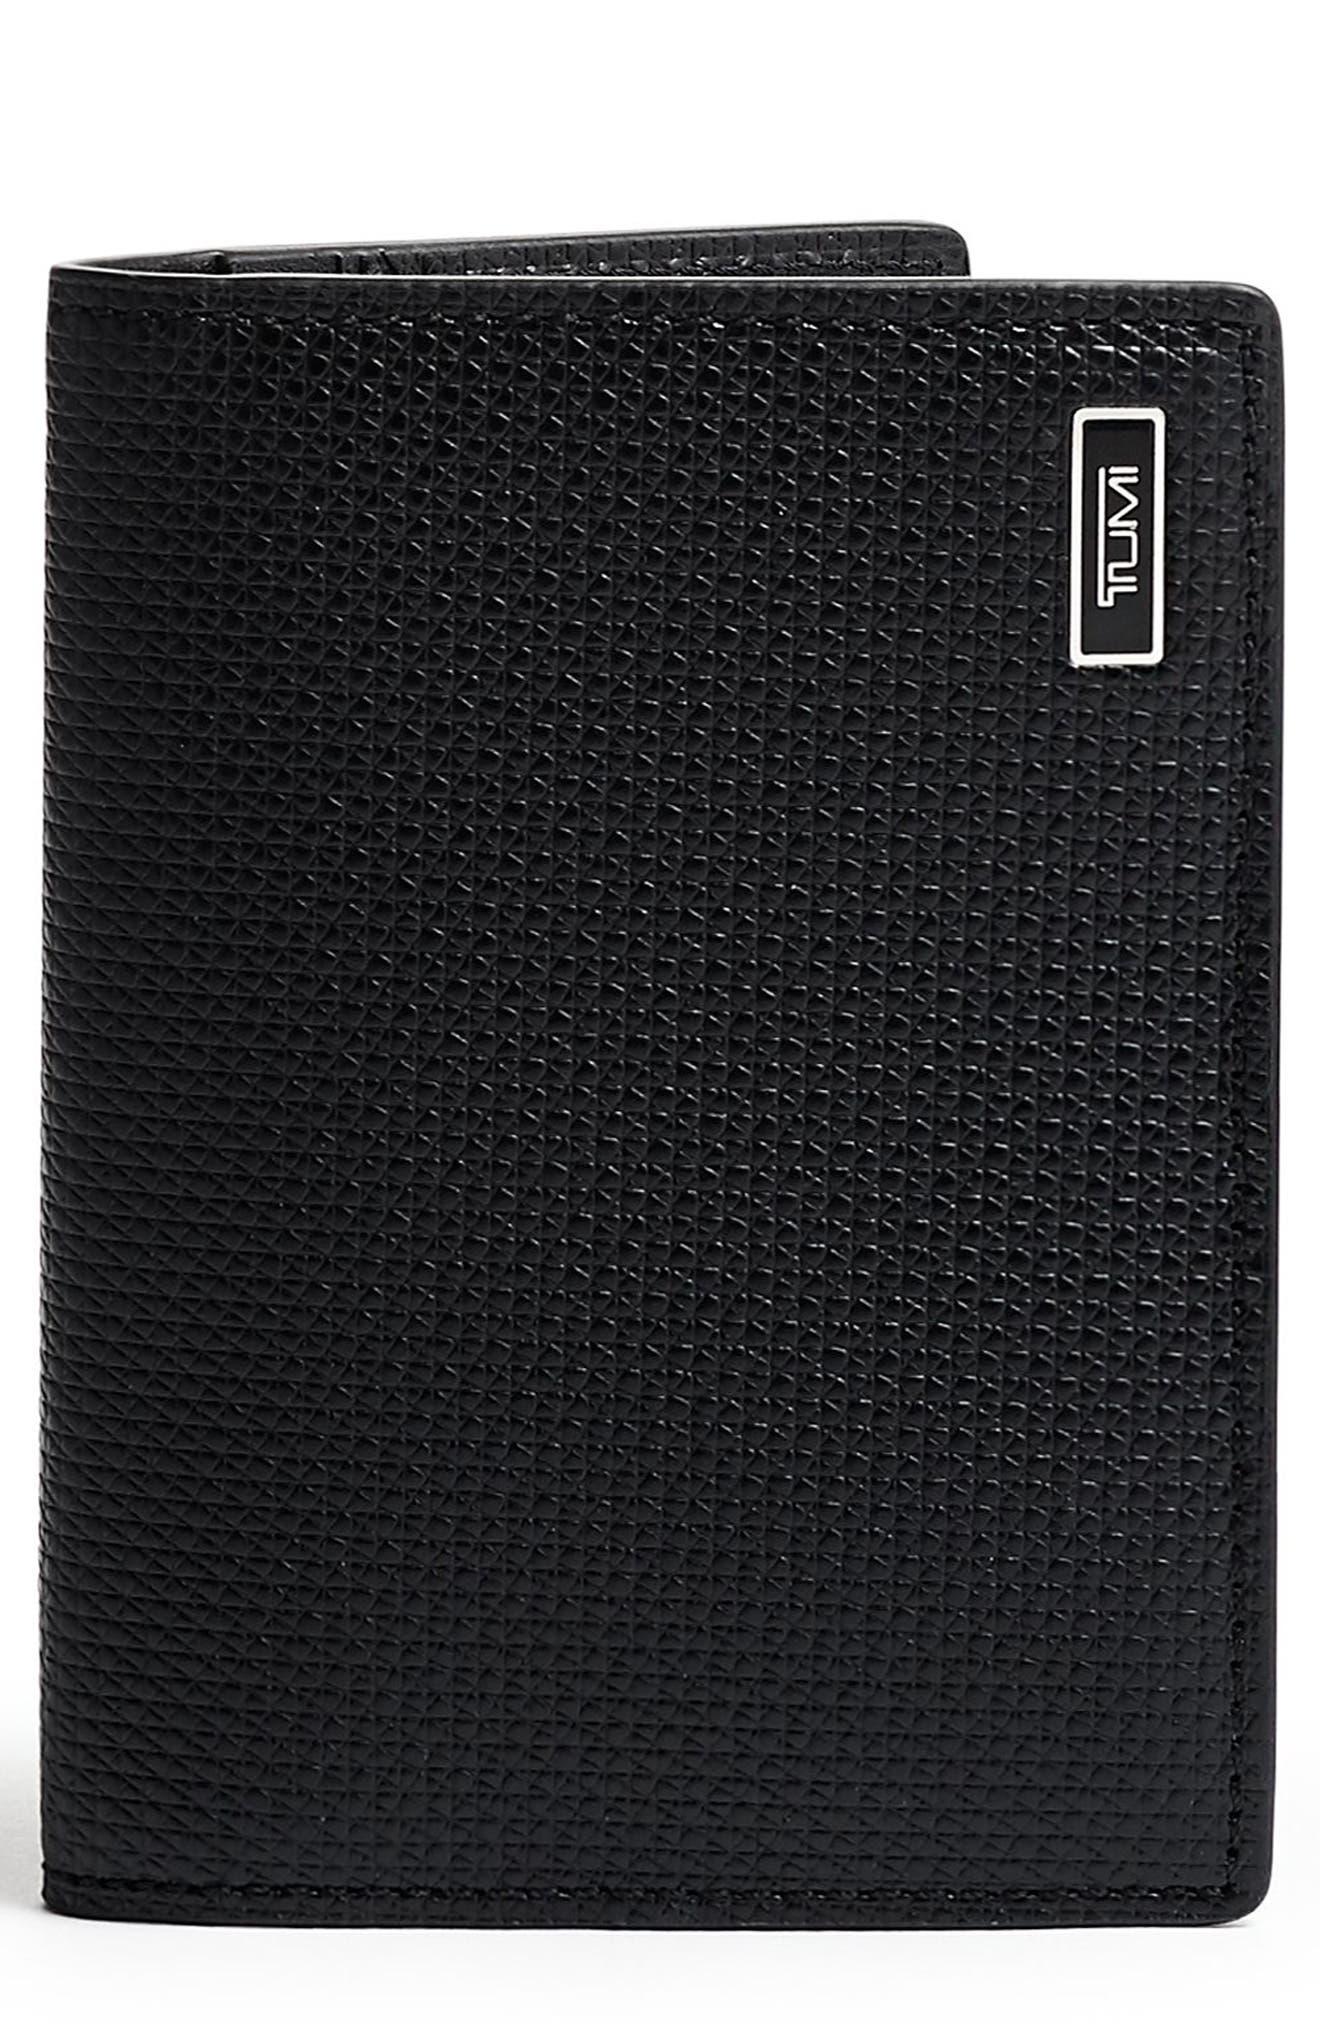 Monaco Folding Leather Card Case, Main, color, BLACK